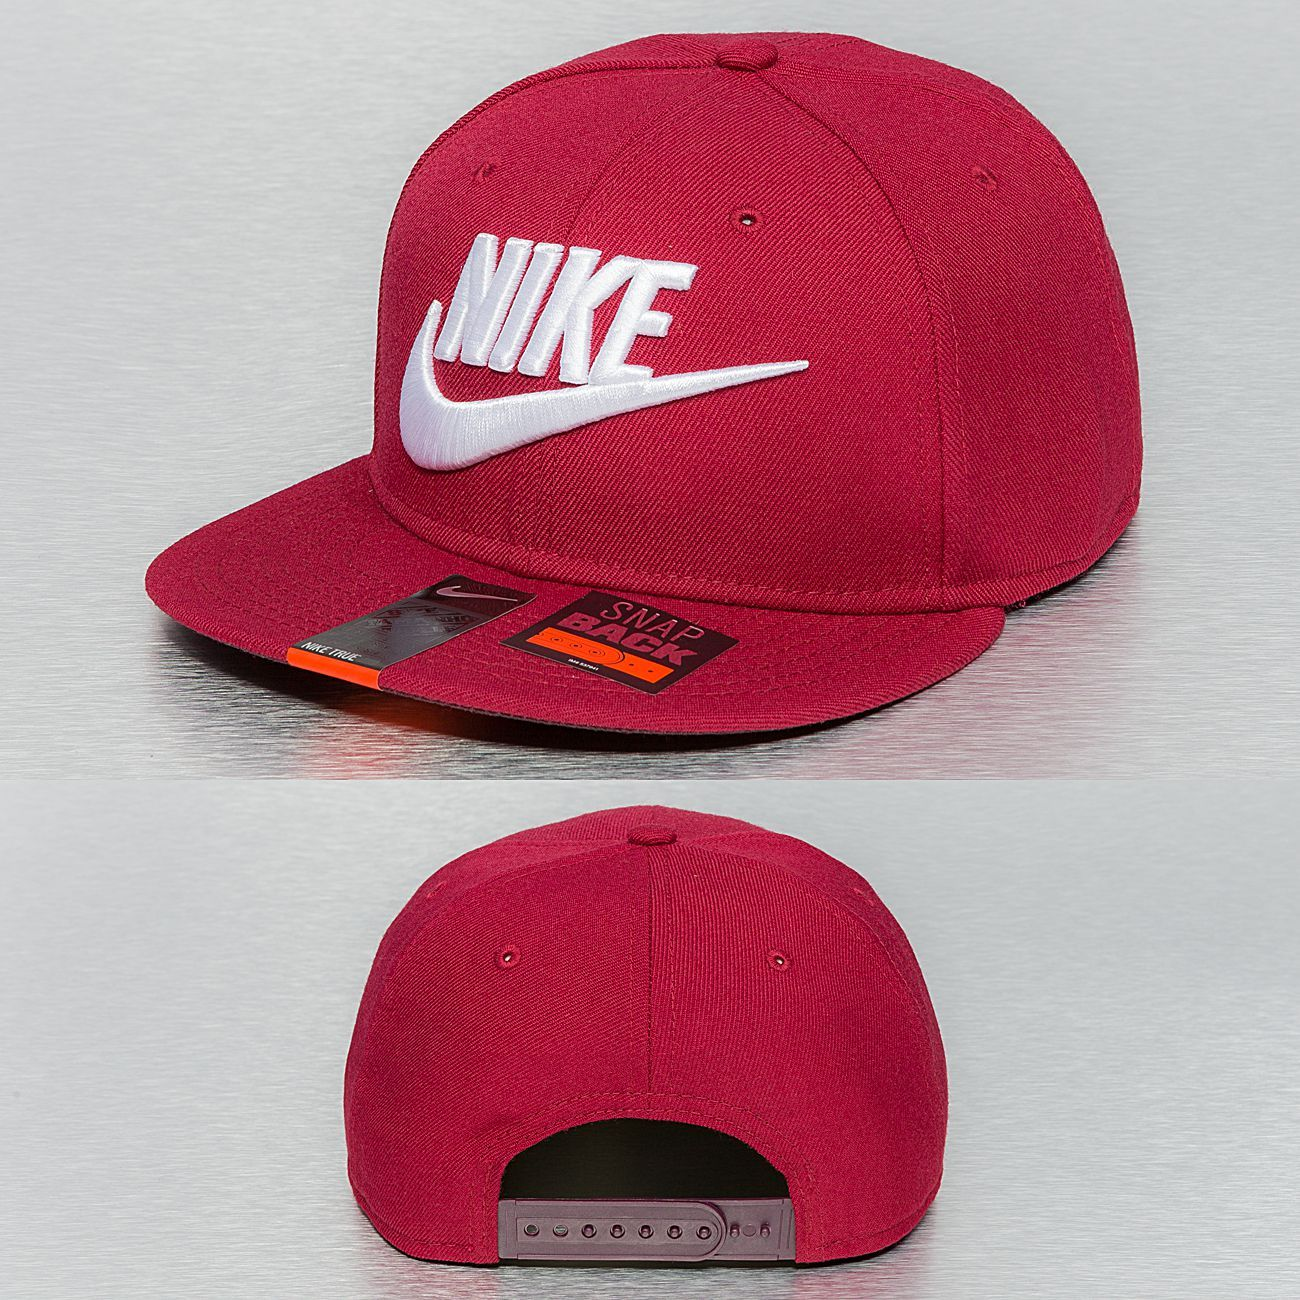 Nike Limitless True Snapback Cap Team Red White  2a78e02ce416